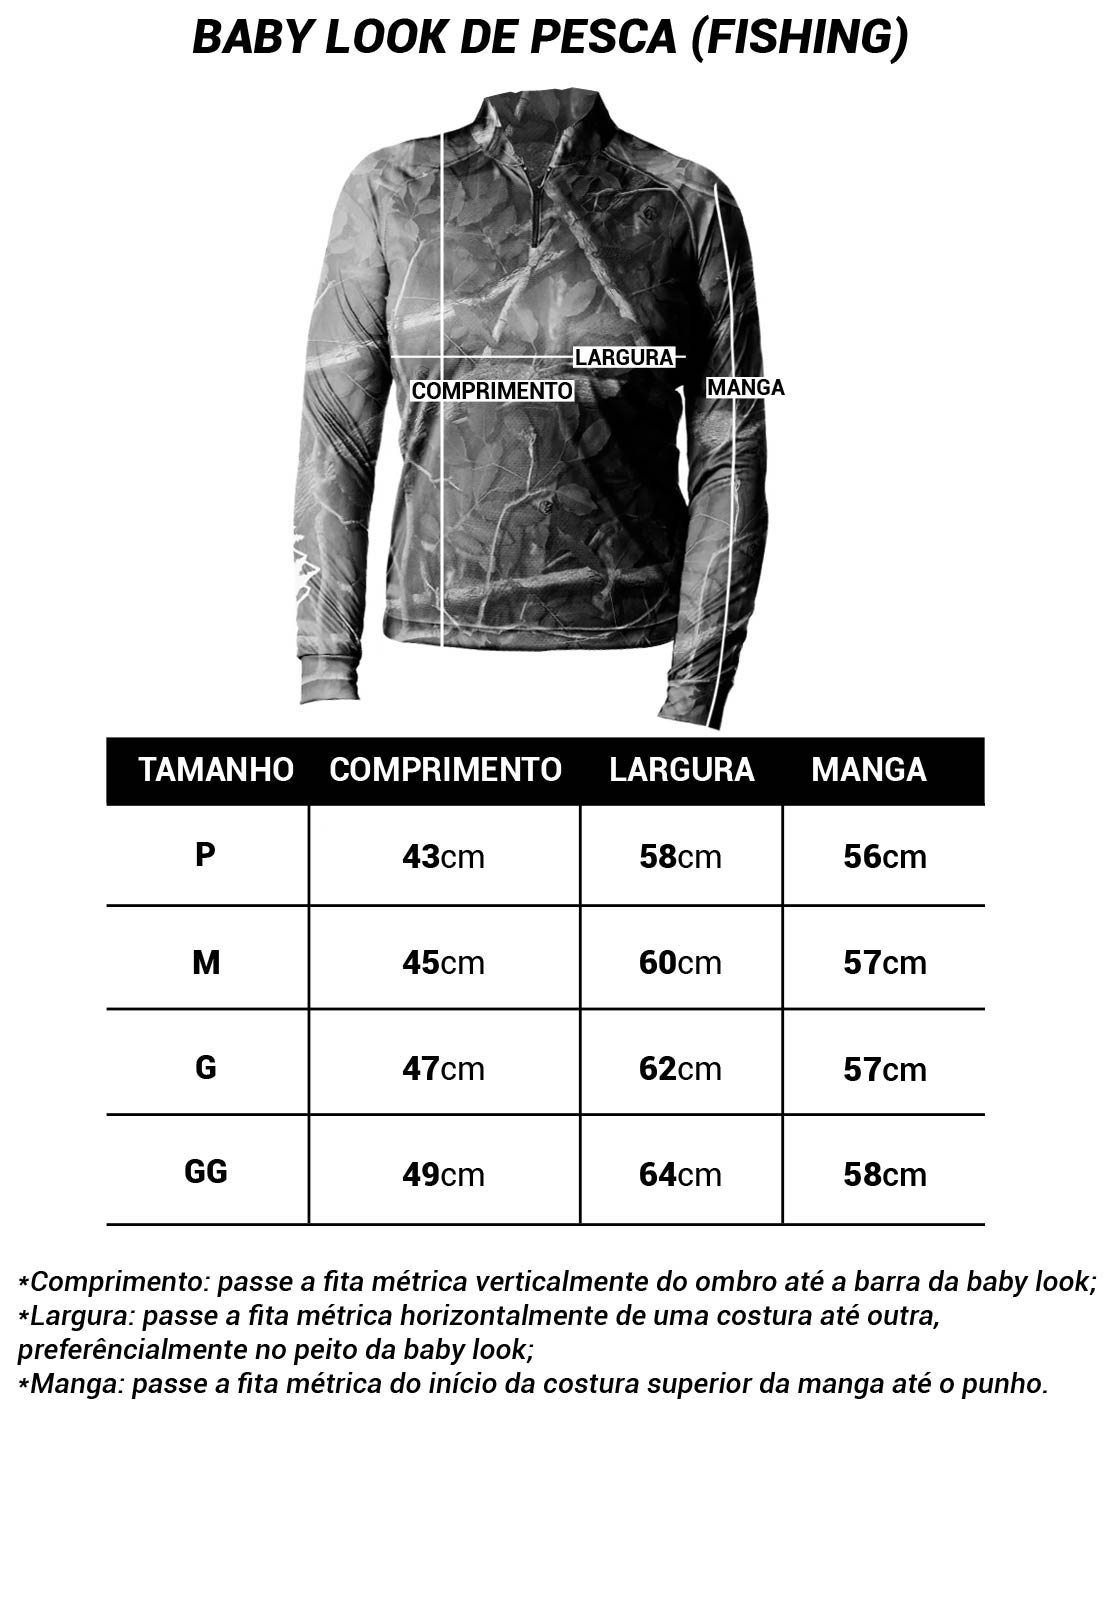 CAMISA DE PESCA FISH CAMUFLADA PRO 22 FEMININA + BANDANA GRÁTIS  - Real Hunter